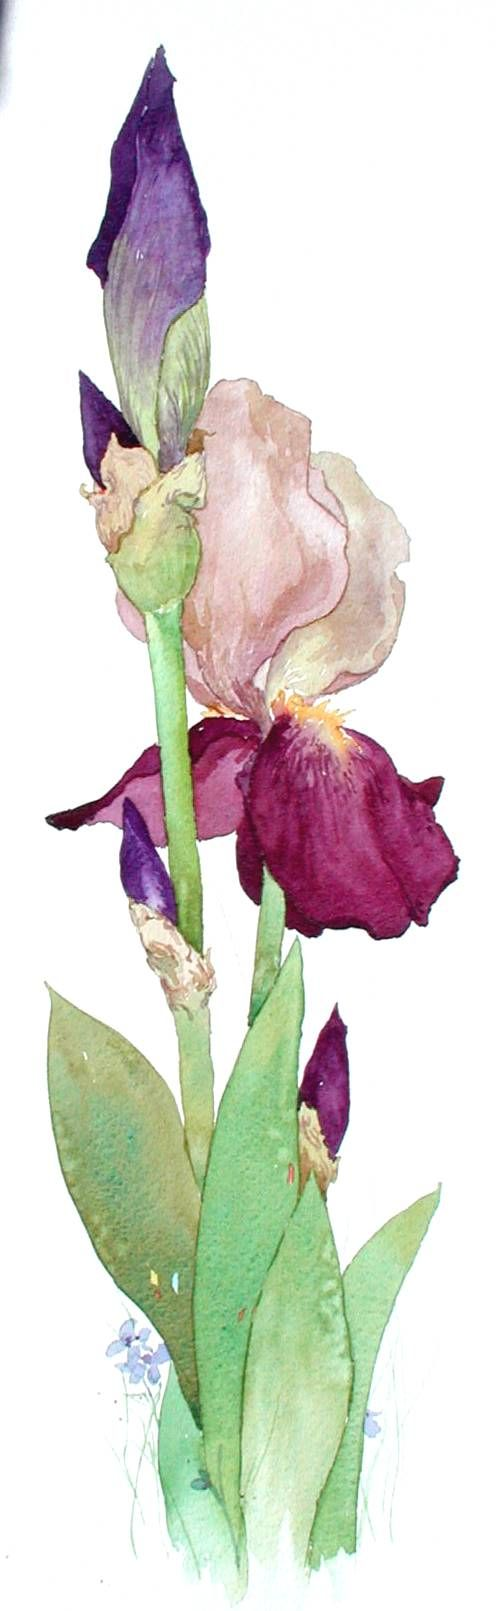 Jerianne Van Dijk WATERCOLOR - I don't like bearded iris, but this is wonderful